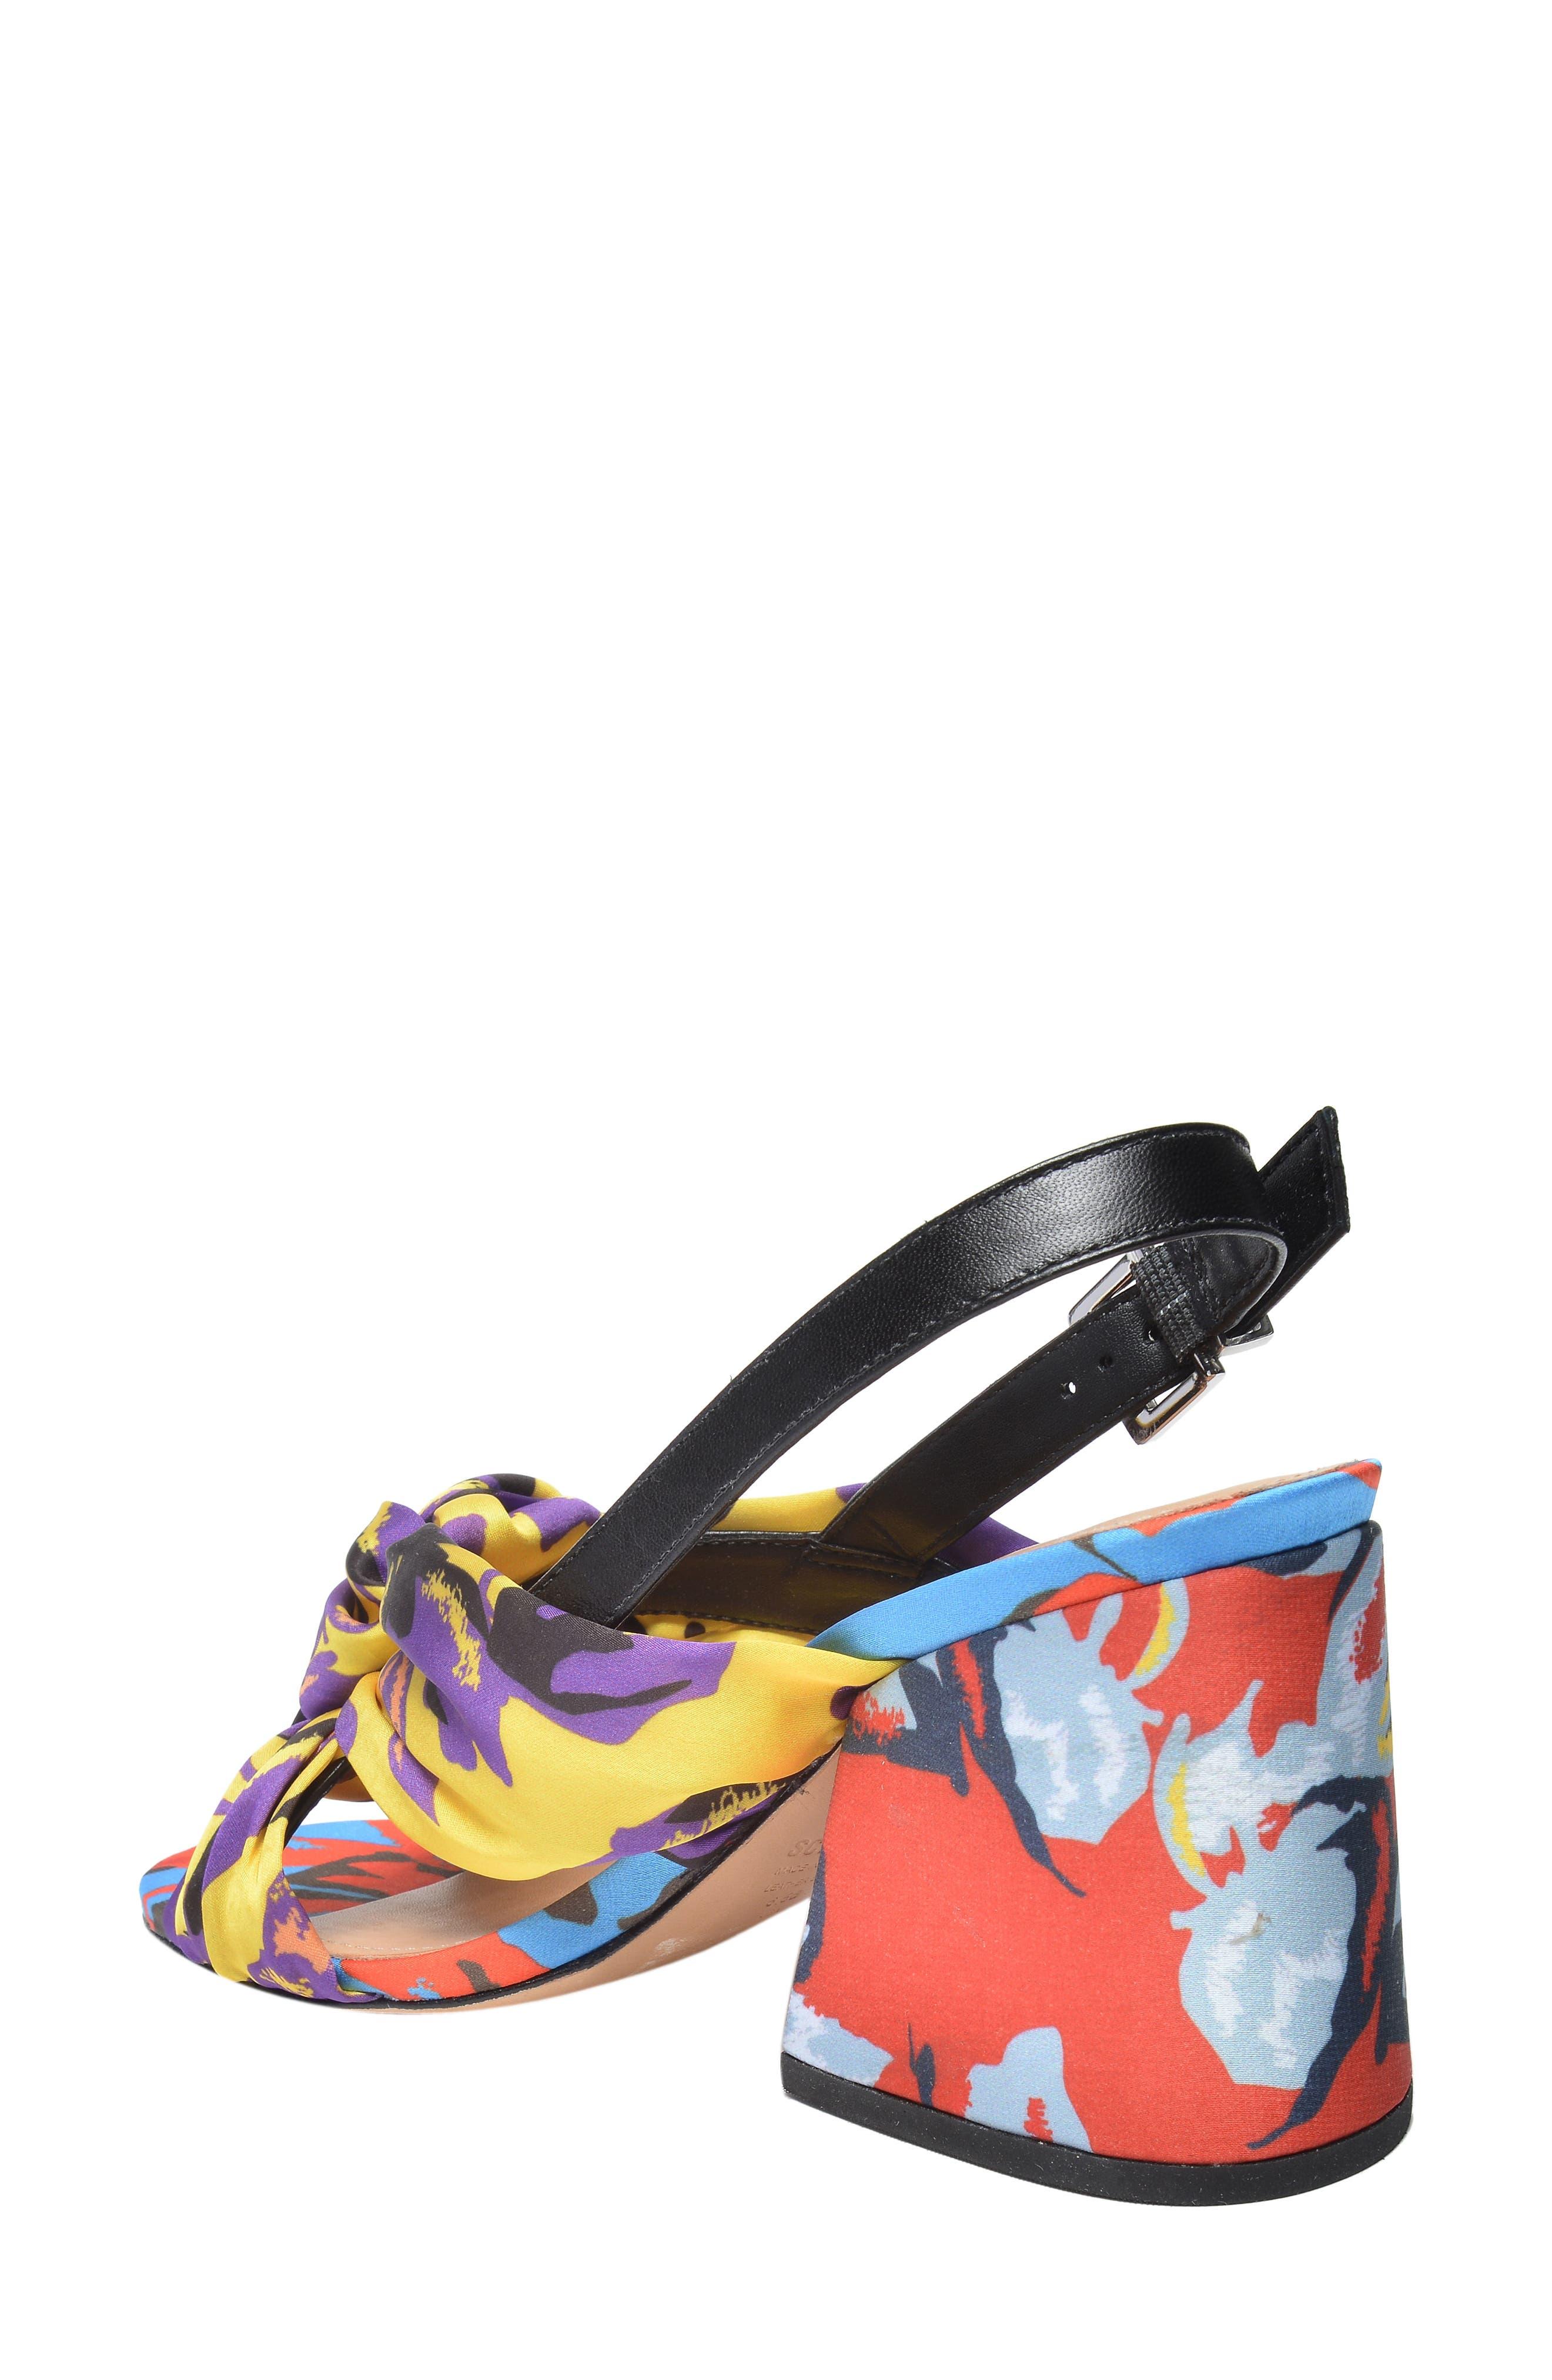 x Adriana Lima Sandal,                             Alternate thumbnail 2, color,                             Floral Print Fabric